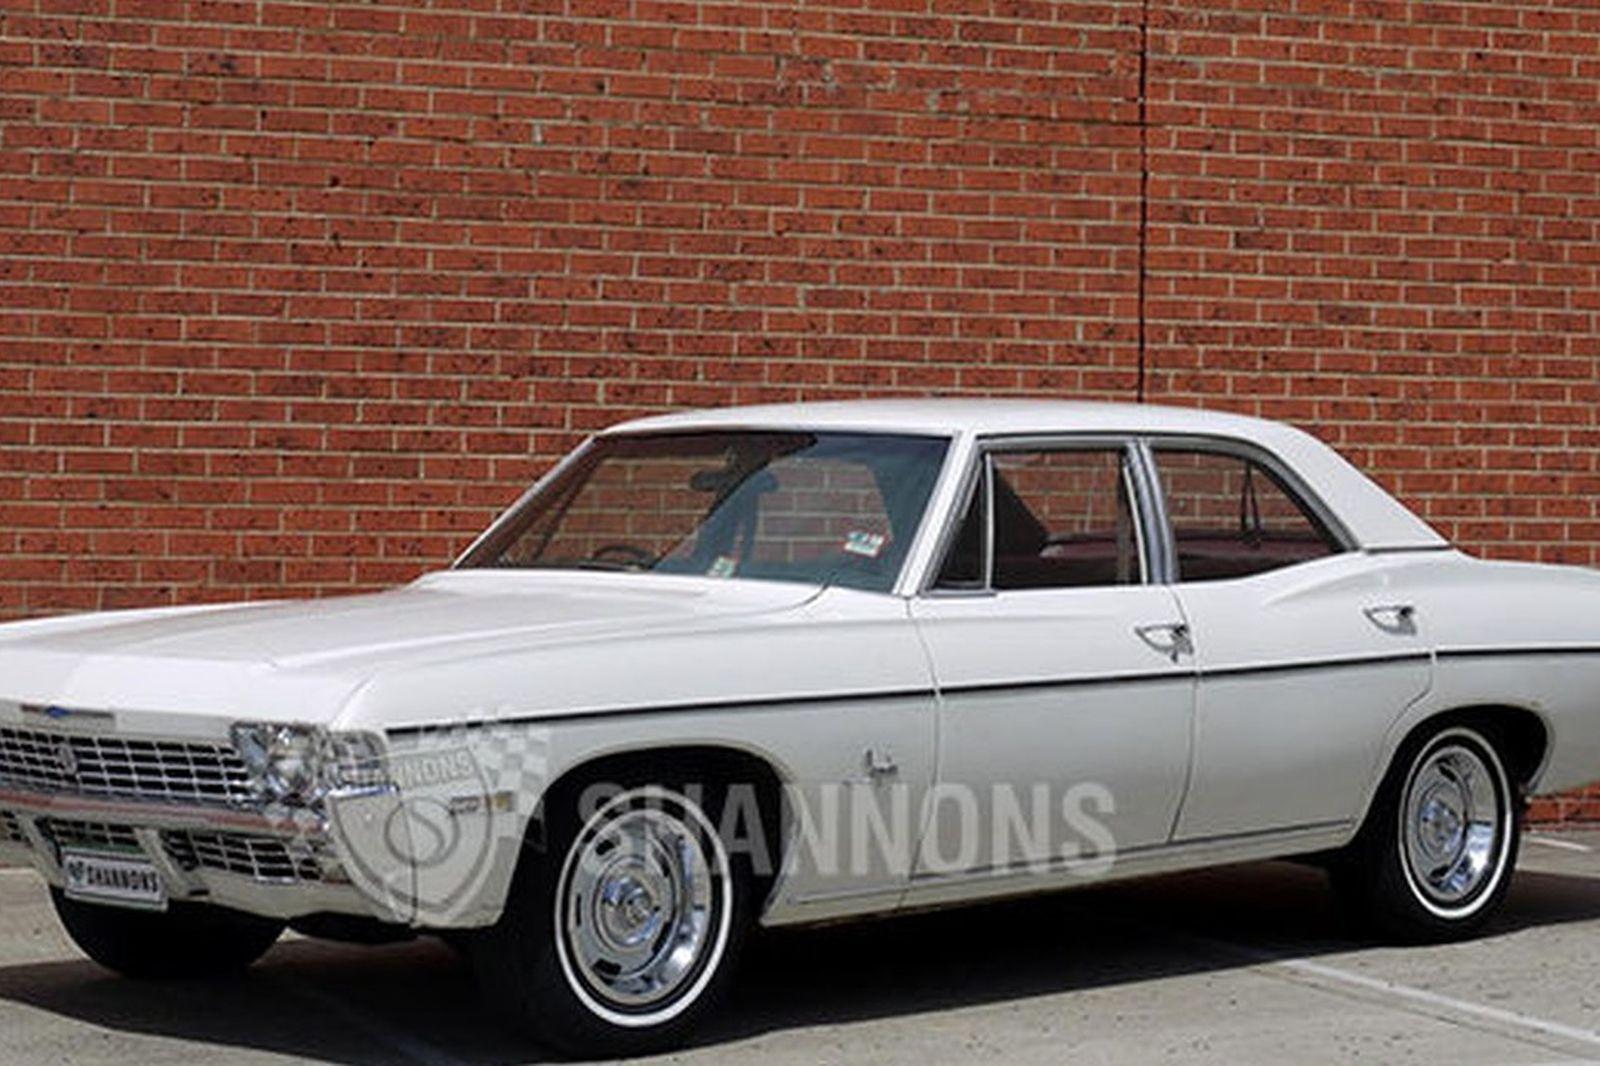 Sold Chevrolet Impala 4 Door Sedan Rhd Auctions Lot 35 Shannons